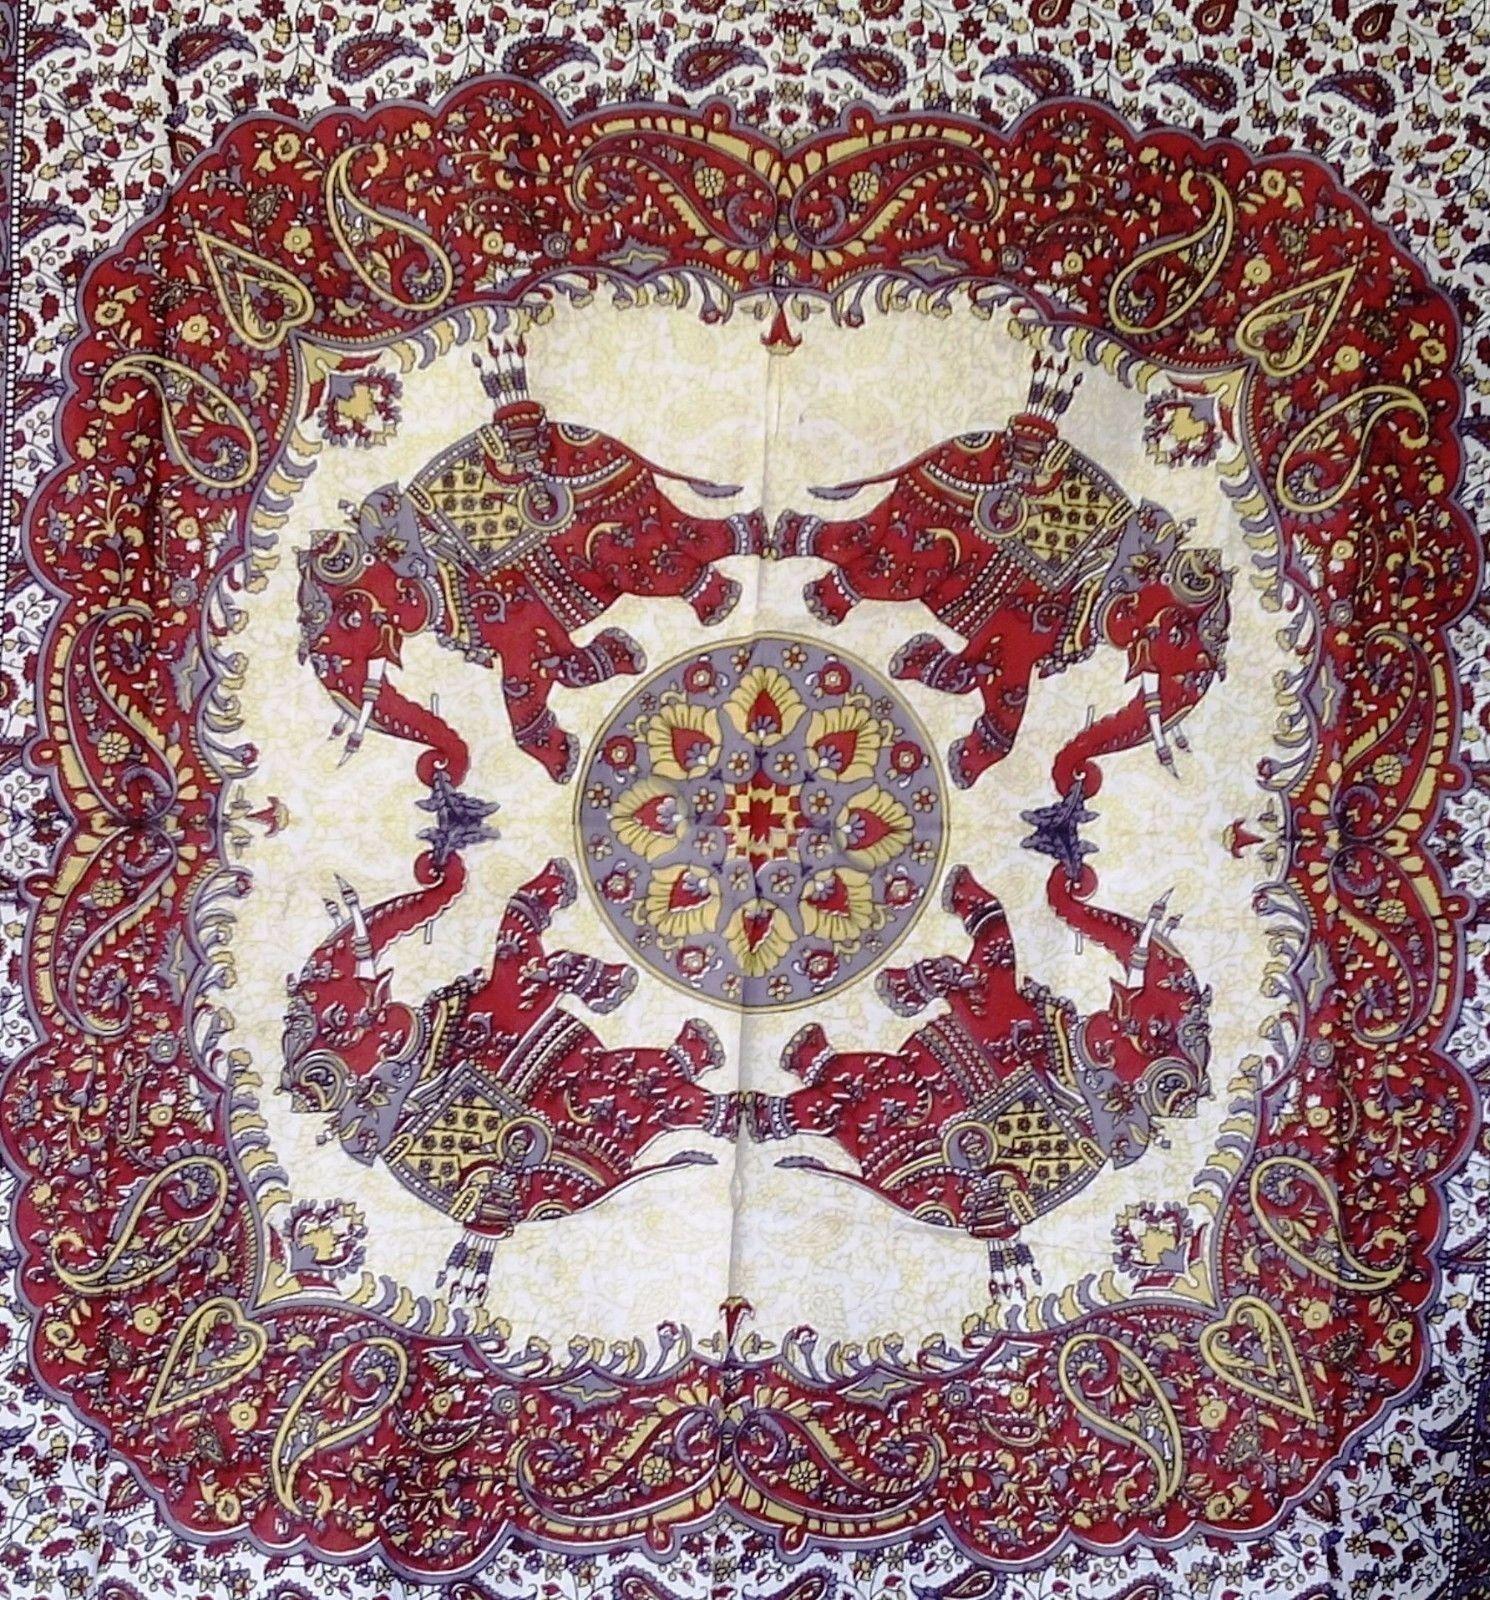 Indian Handmade Red Bedsheet Mandala Hippie Wall Hanging Tapestry Wall Decor Art Ebay Wall Tapestry Wall Hanging Wall Art Decor